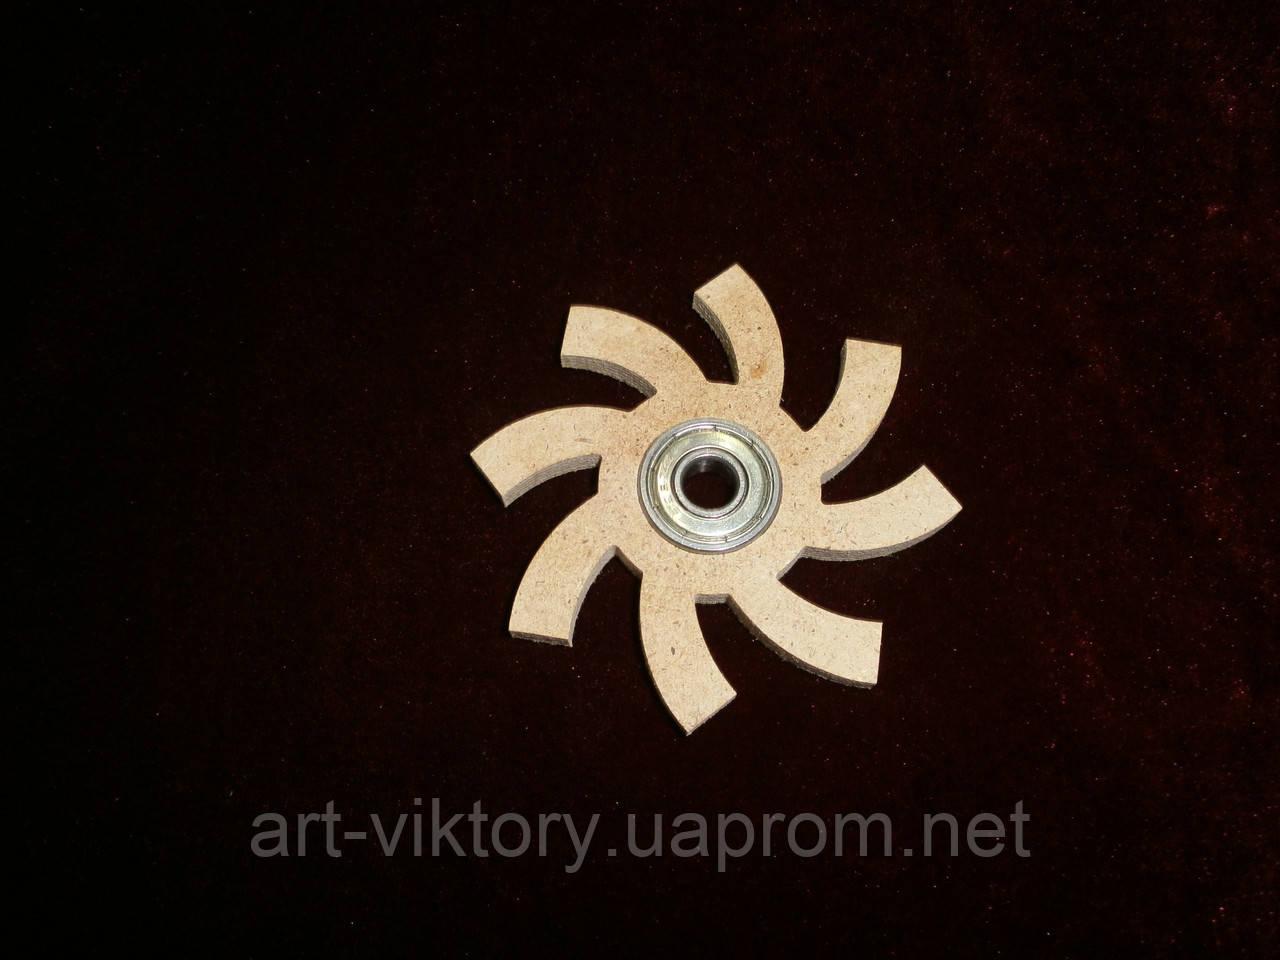 Спиннер игрушка солнышко (7,5 х 7,5 см), декор